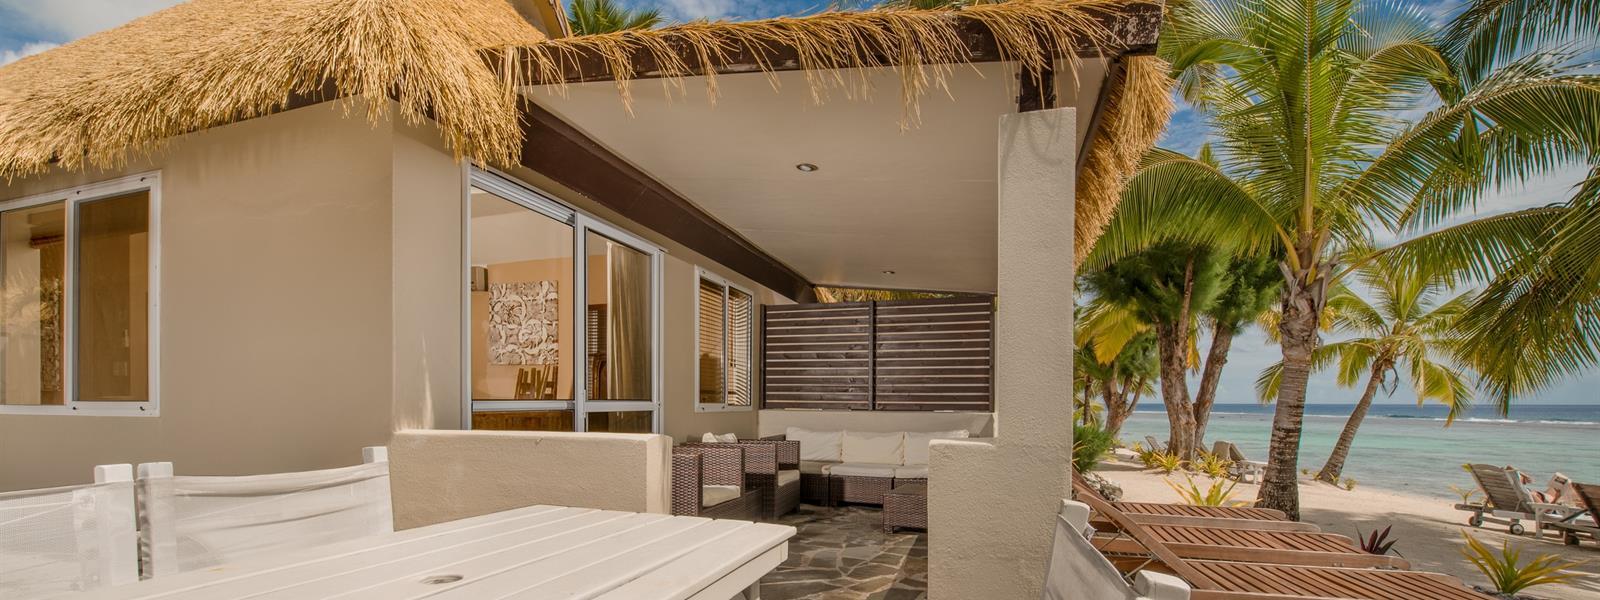 Crown Beach Resort u0026 Spa Rarotonga